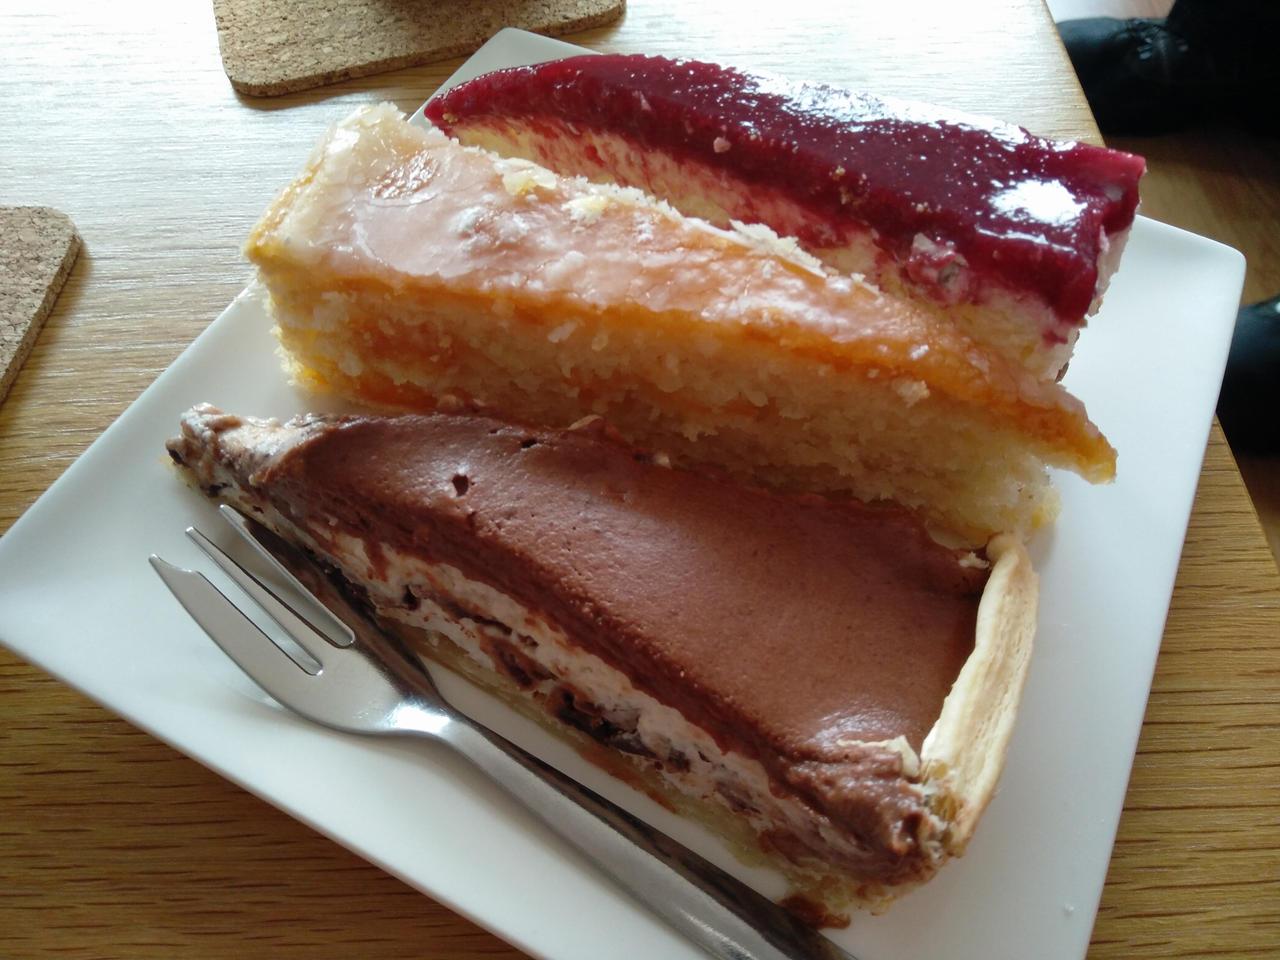 Triple birthday cake